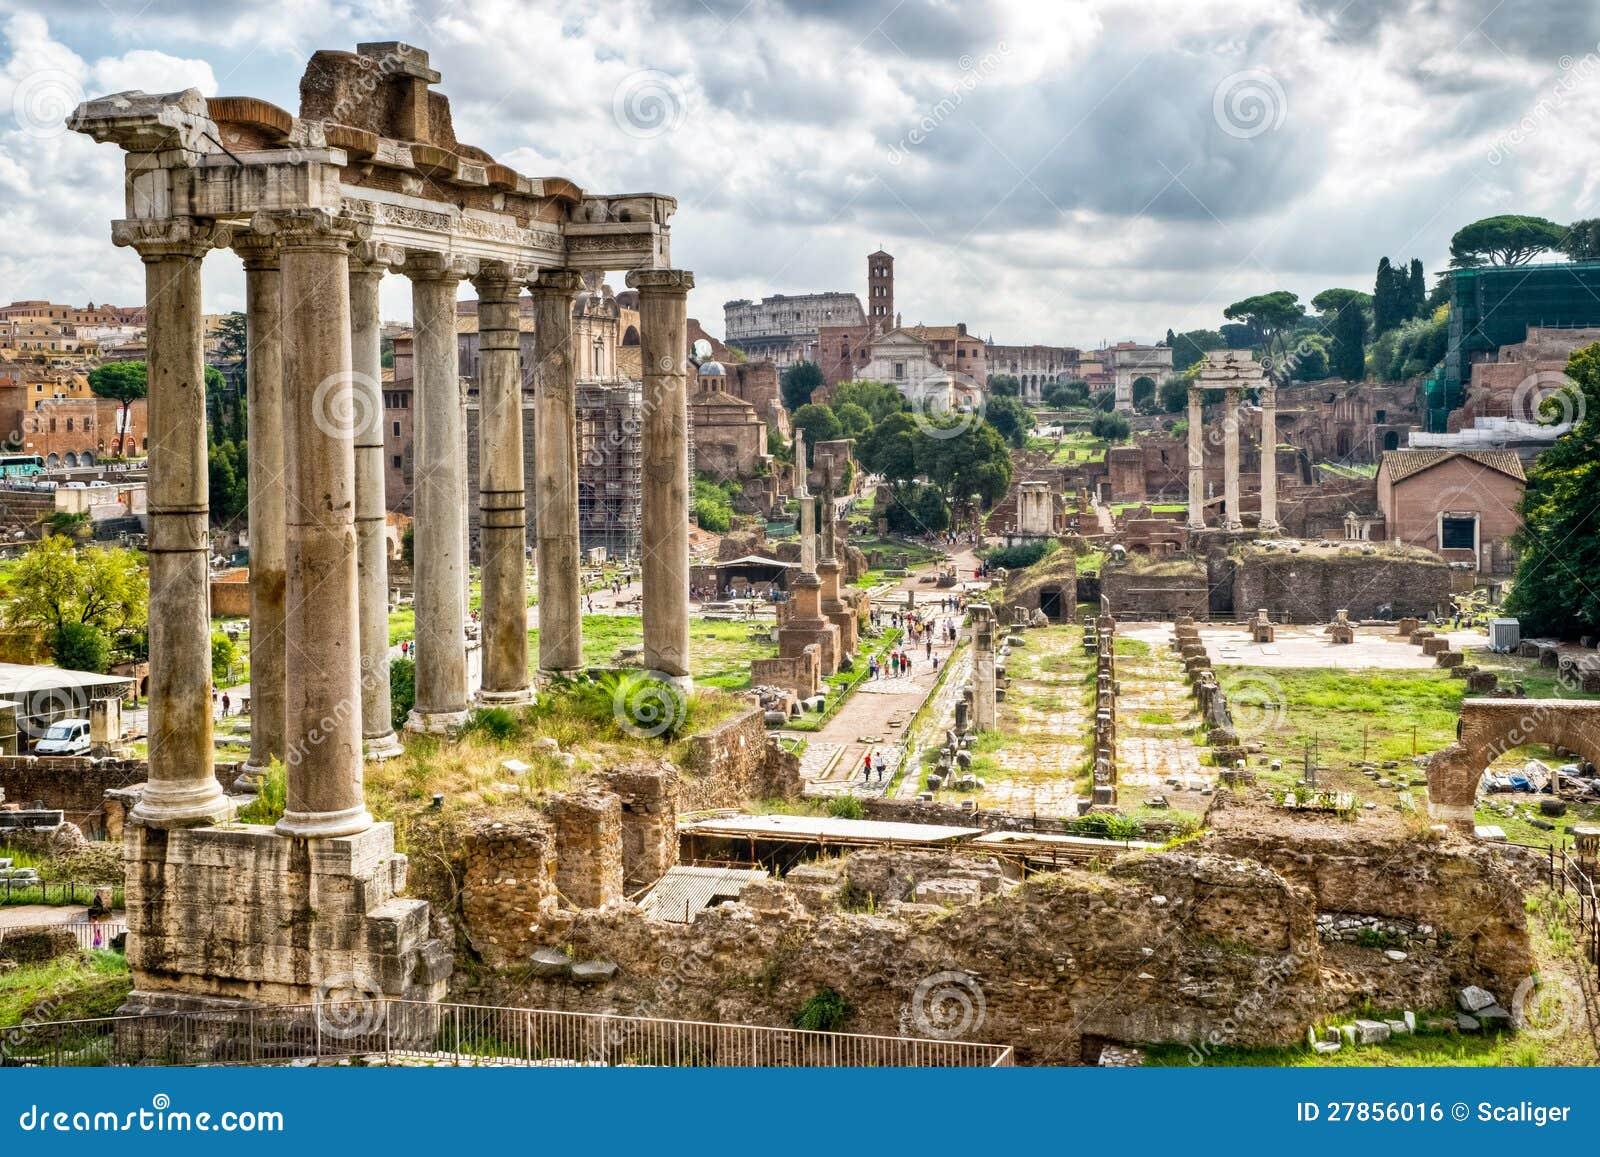 Romańska dawność: Widok Romański Forum